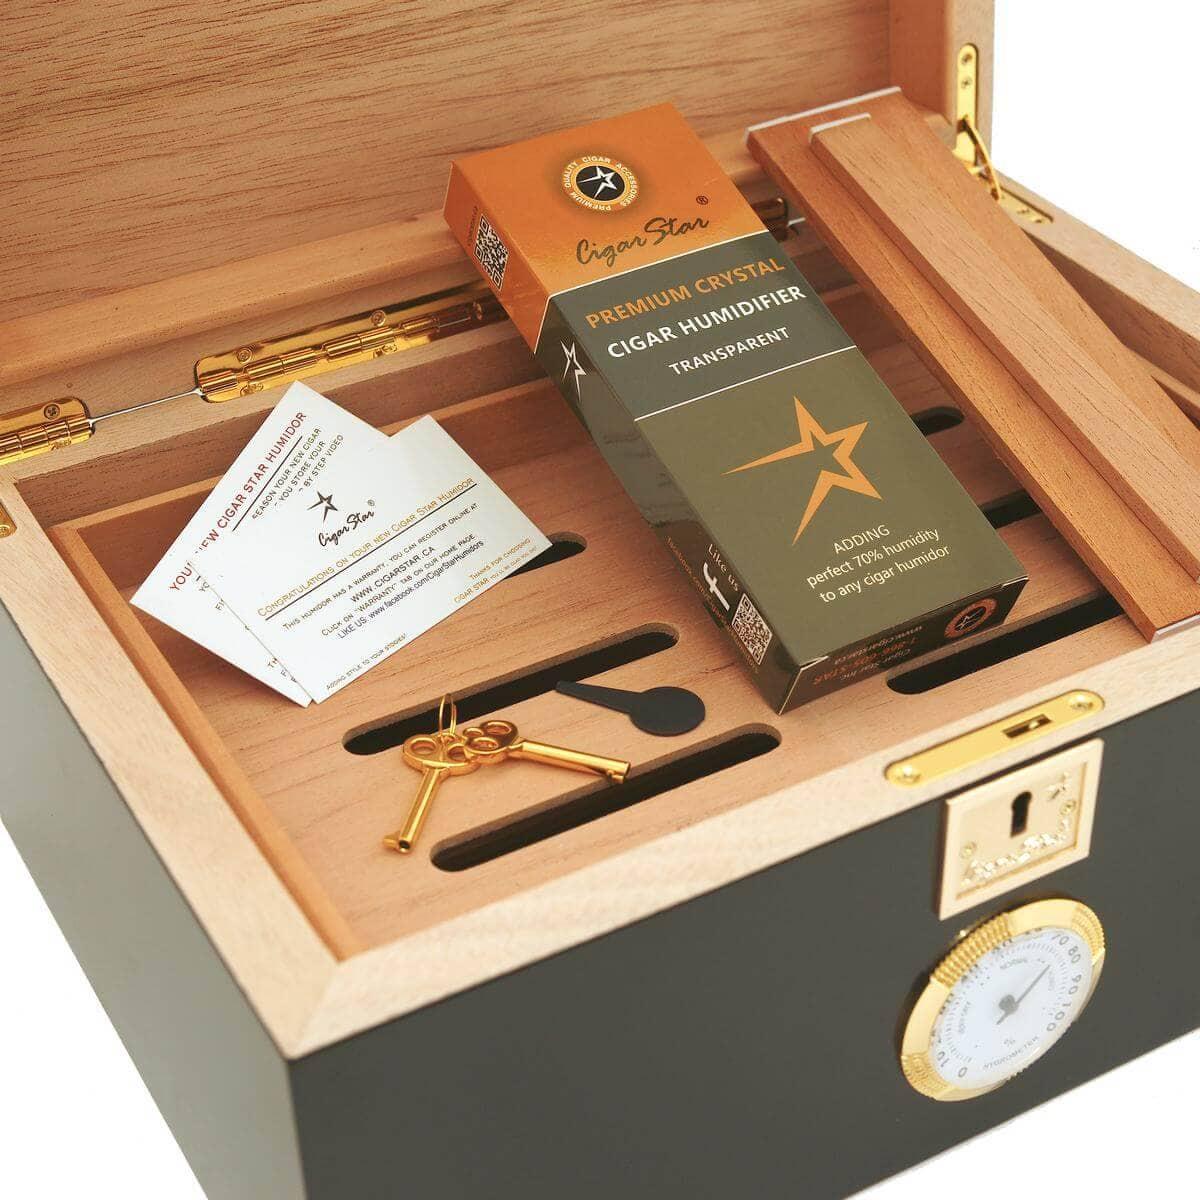 Classic Black Cigar Humidor For 120 Cigars Cigar Star